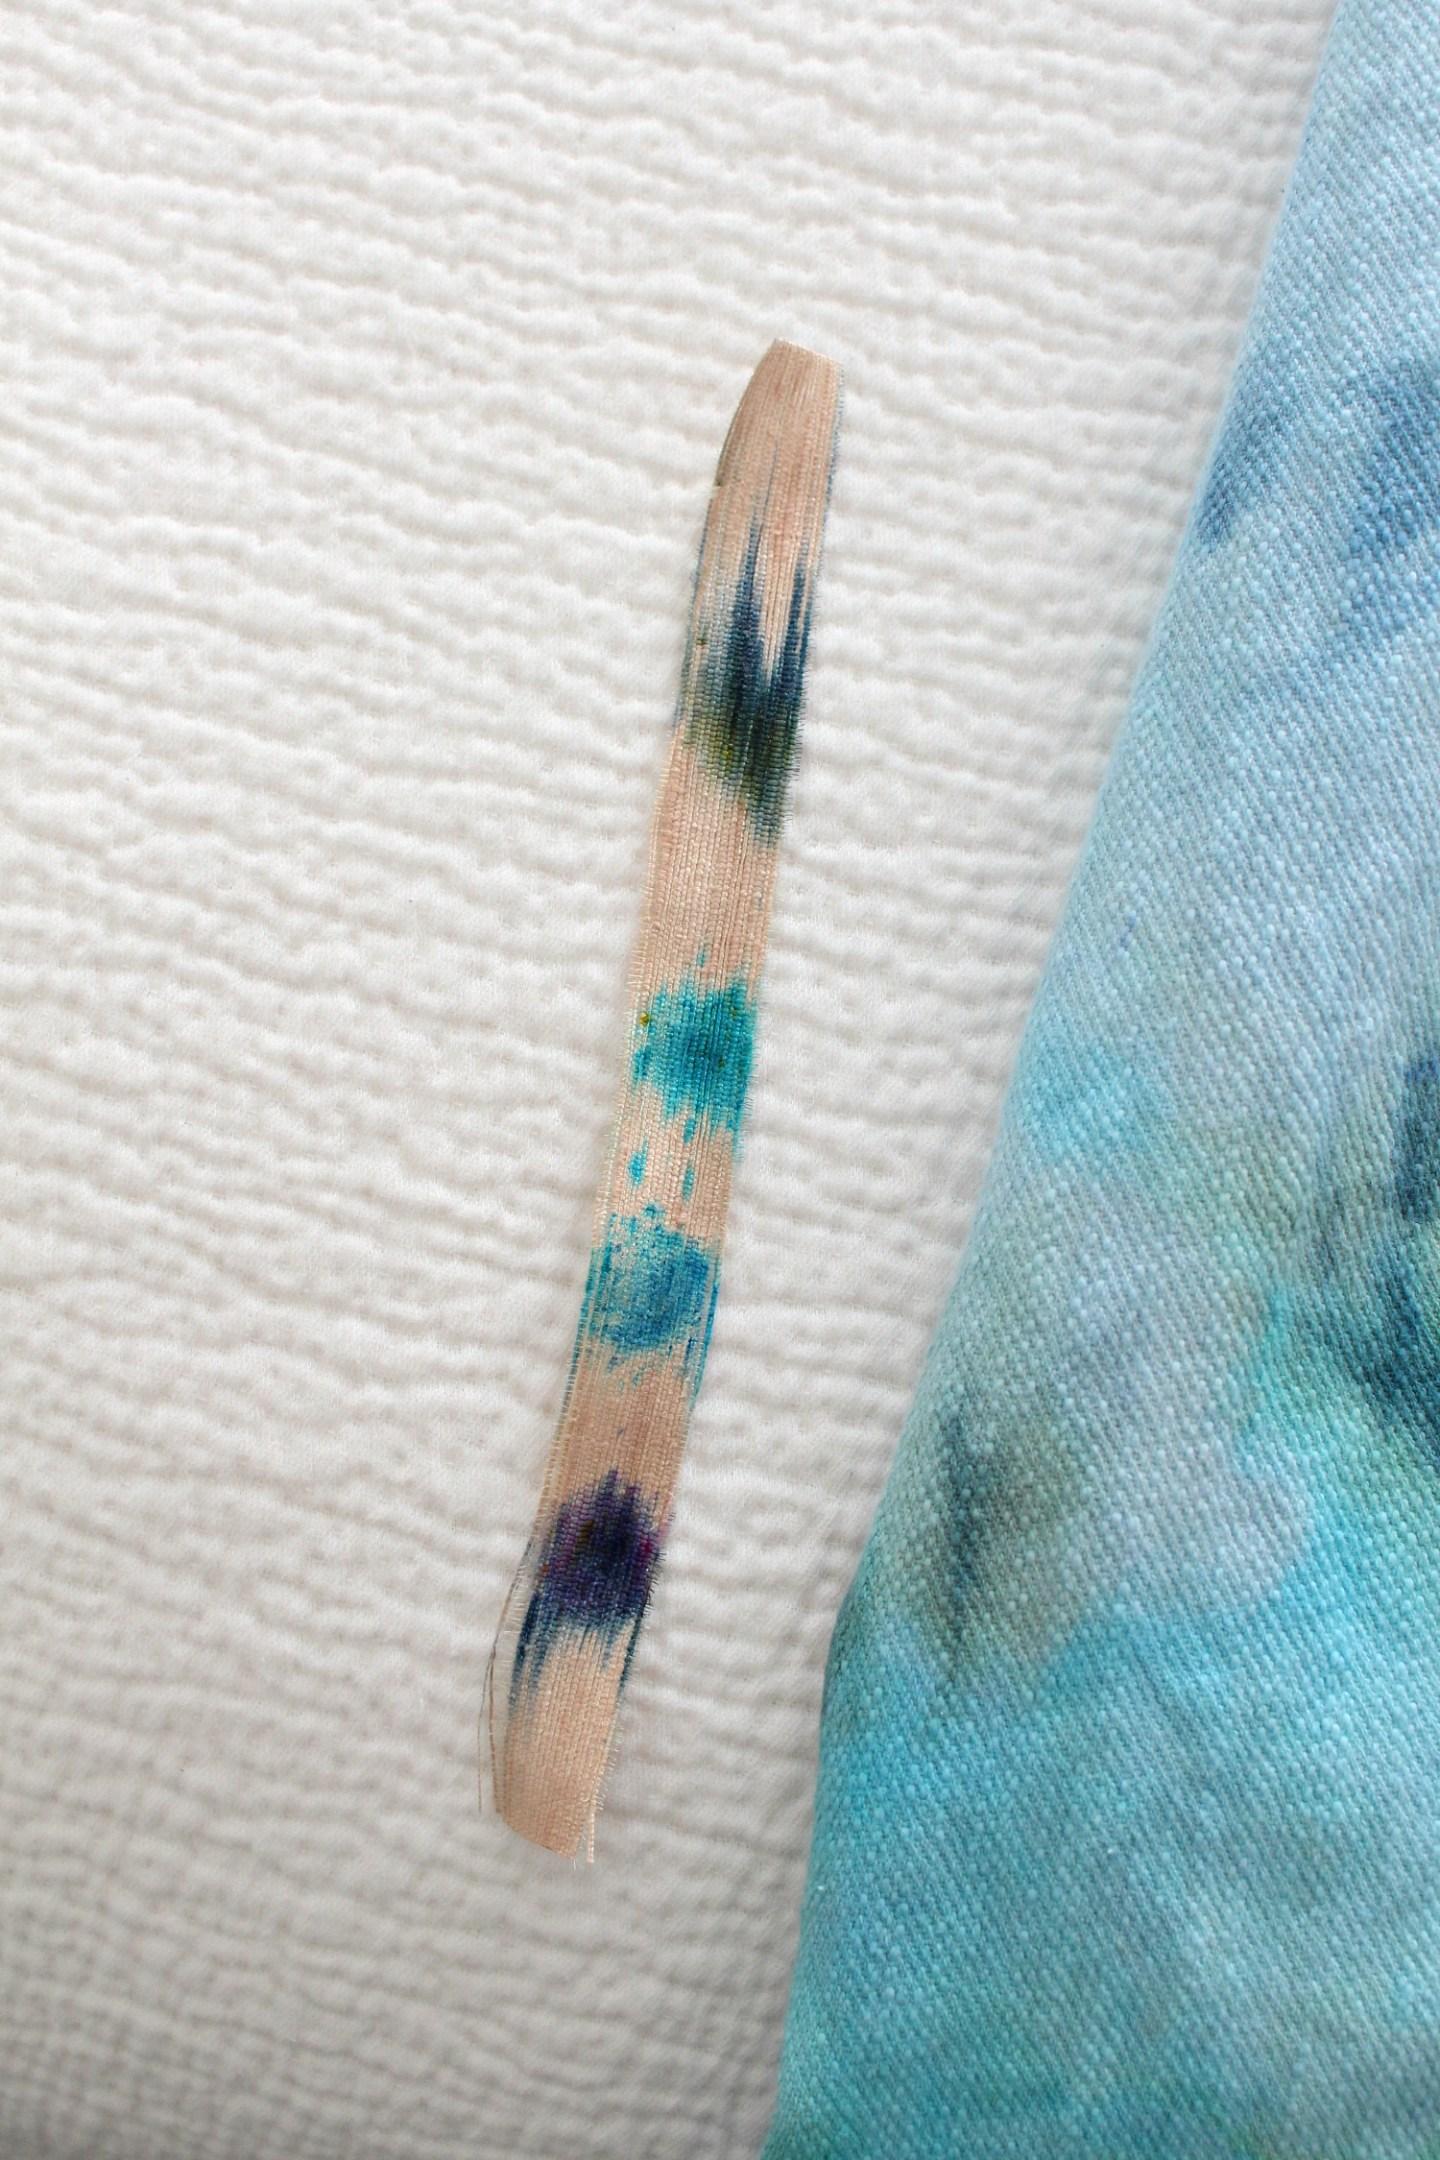 Procion Dyes on Silk